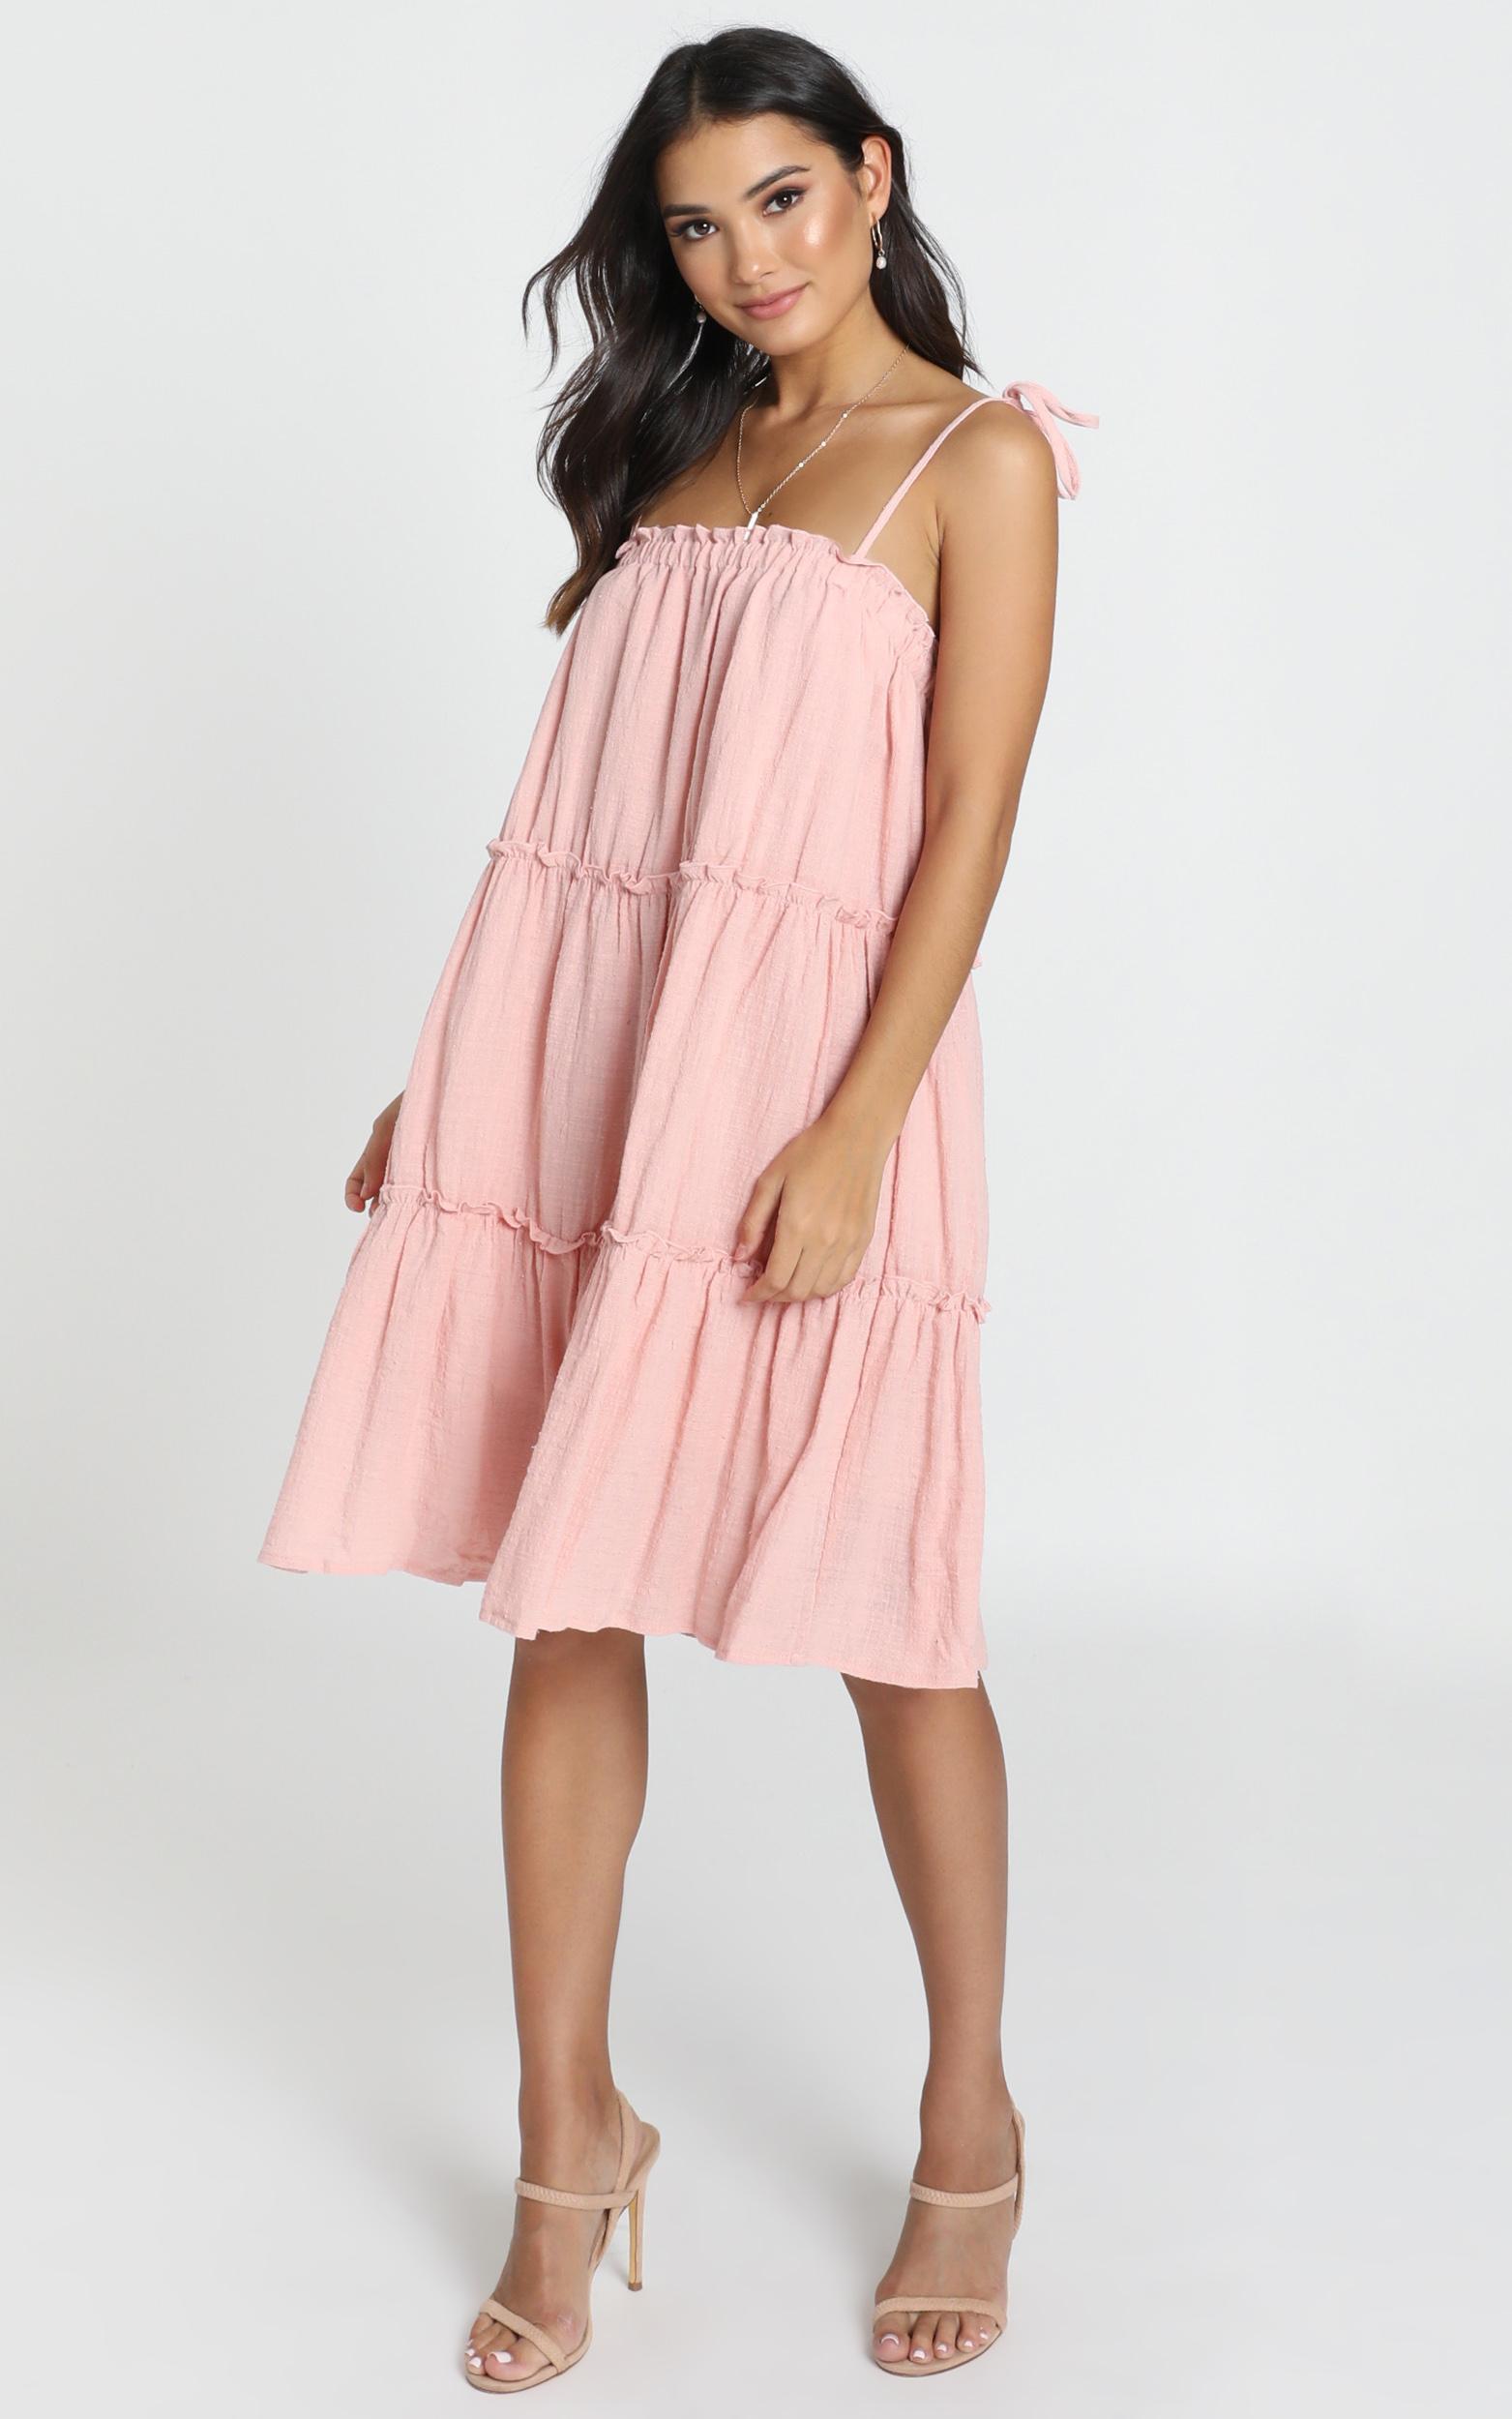 Rosabel Tiered Smock Dress in pink - 14 (XL), Pink, hi-res image number null